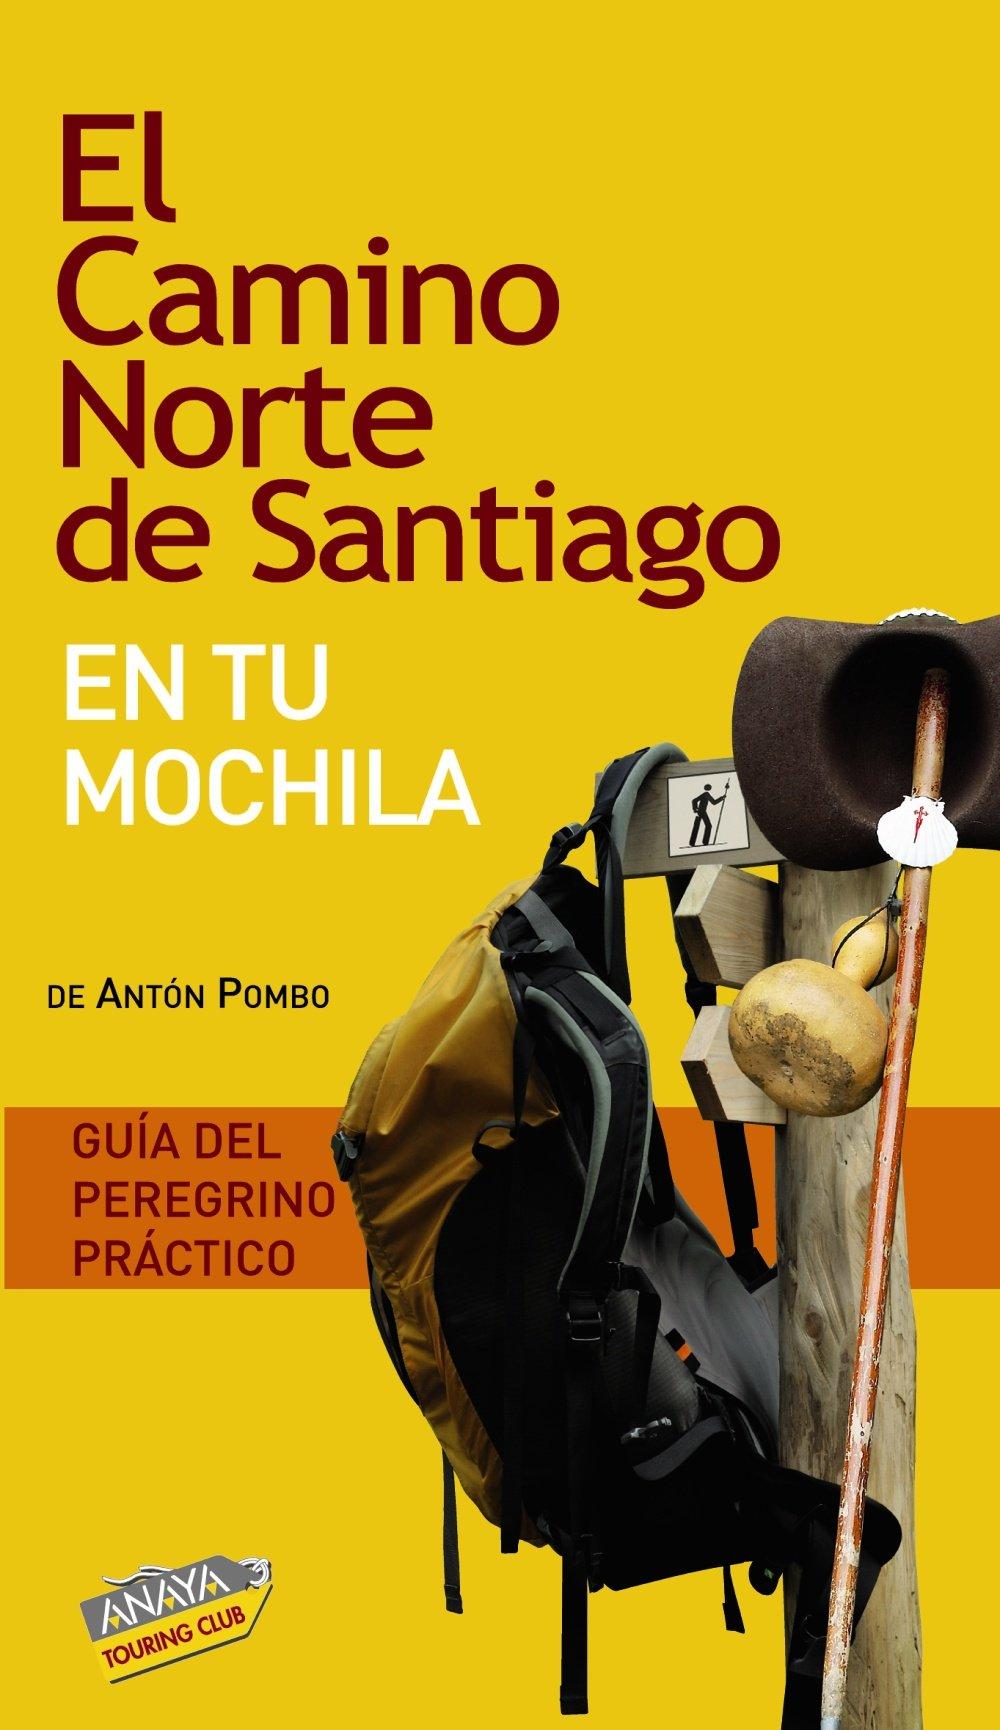 El camino norte de Santiago en tu mochila / Northern Way of St. James in your Backpack (Spanish Edition) (Spanish) Paperback – May 30, 2010